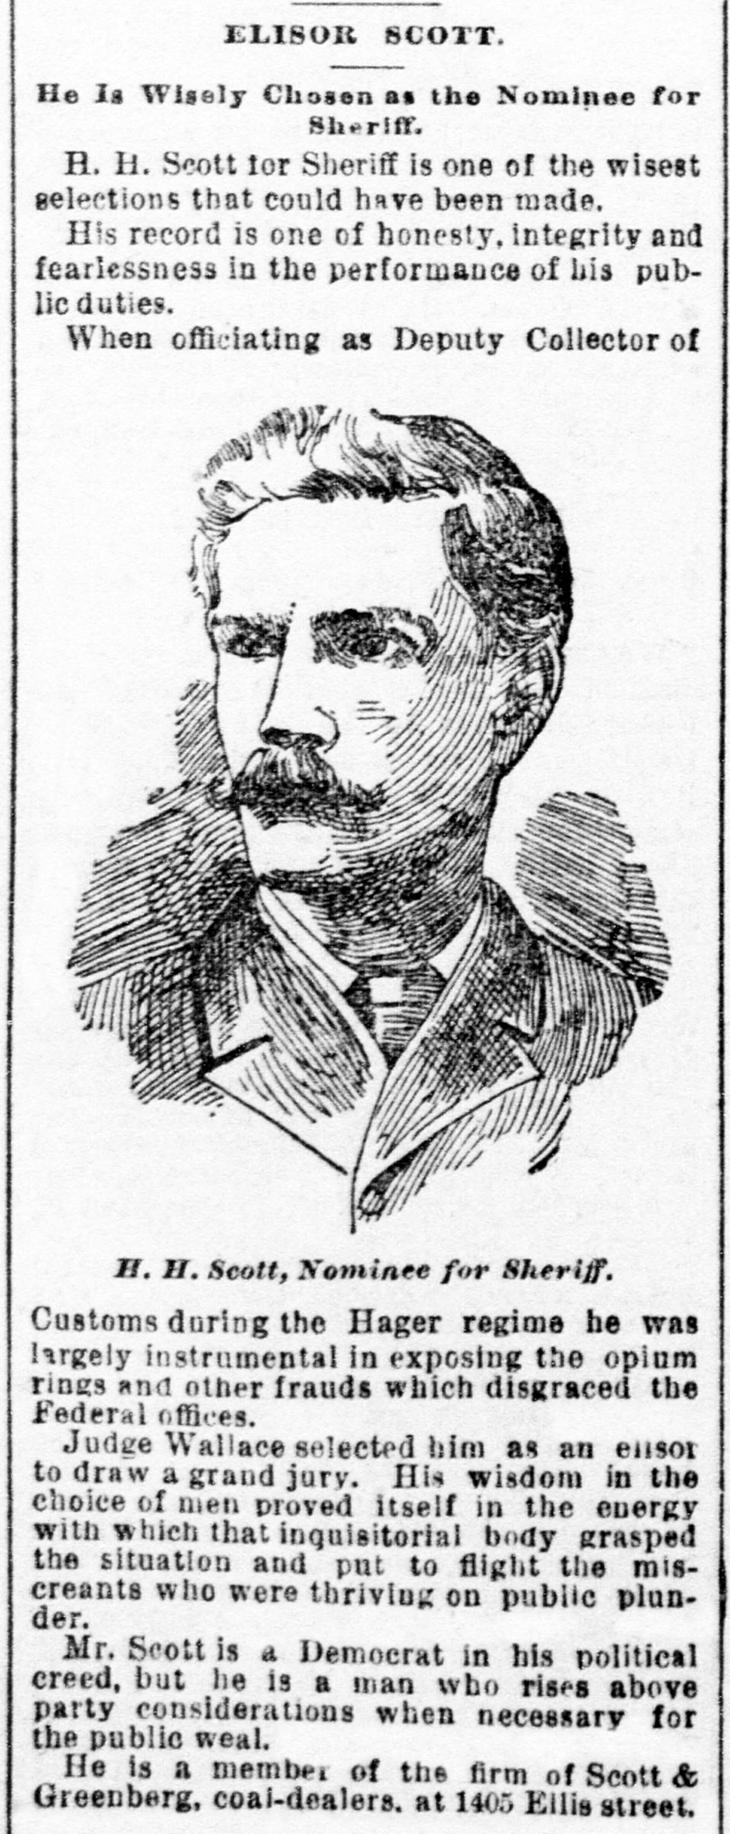 henry harrison scott, henry h scott, merican businessman, san francisco elections, 1892, politics, sheriff, elko county, father of mary crittenden scott,